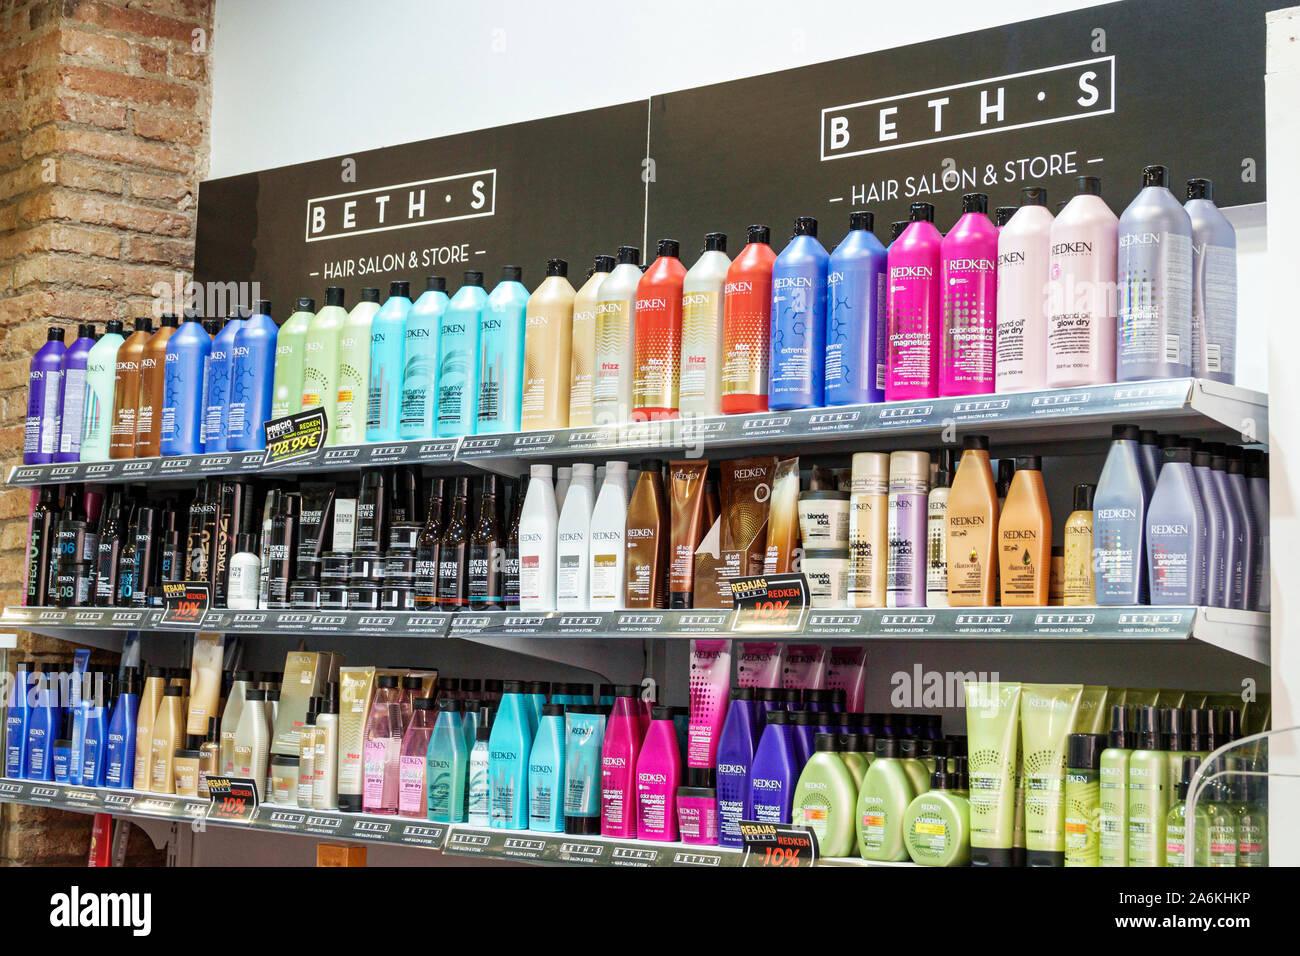 Barcelona Spain Catalonia Catalunya El Poblenou Rambla del Poblenou Beth's Hair Salon Store hair care products display sale Redken brand shopping Span Stock Photo